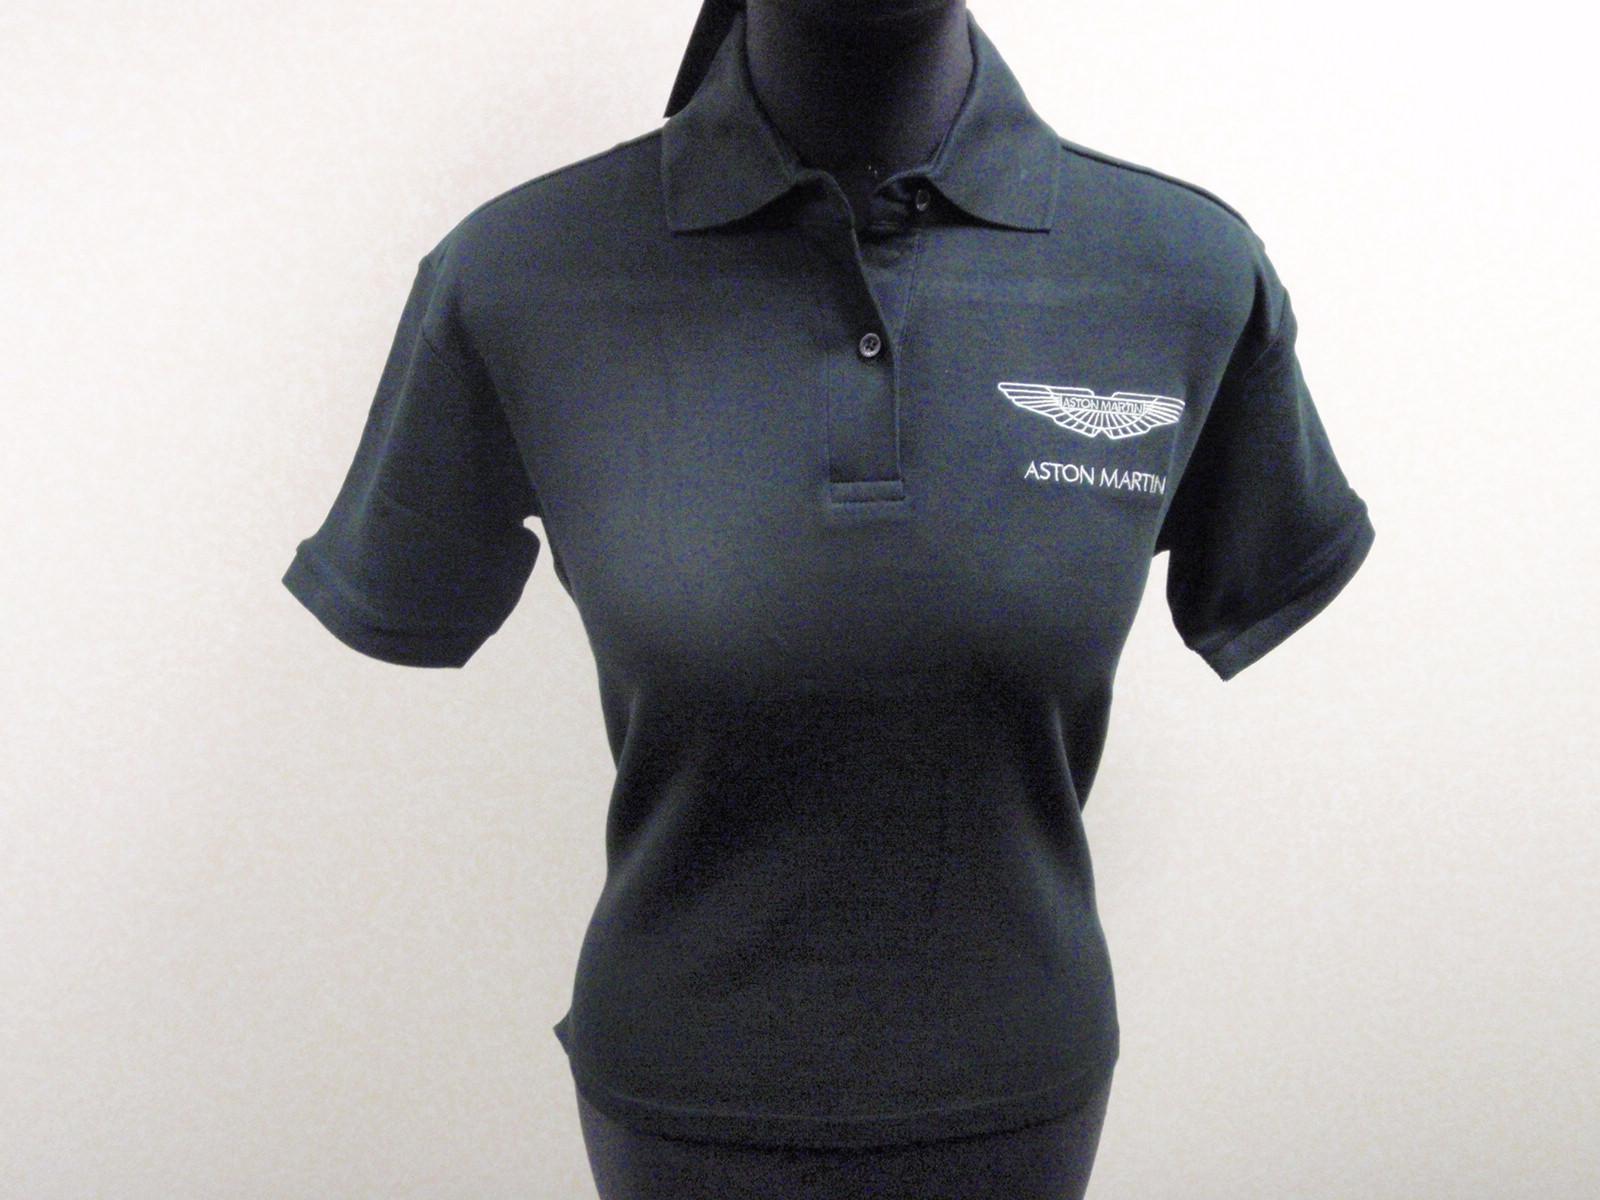 Aston Martin Lagonda Ladies Black Polo Shirt T Shirt w Silver Logo BNWT s M L